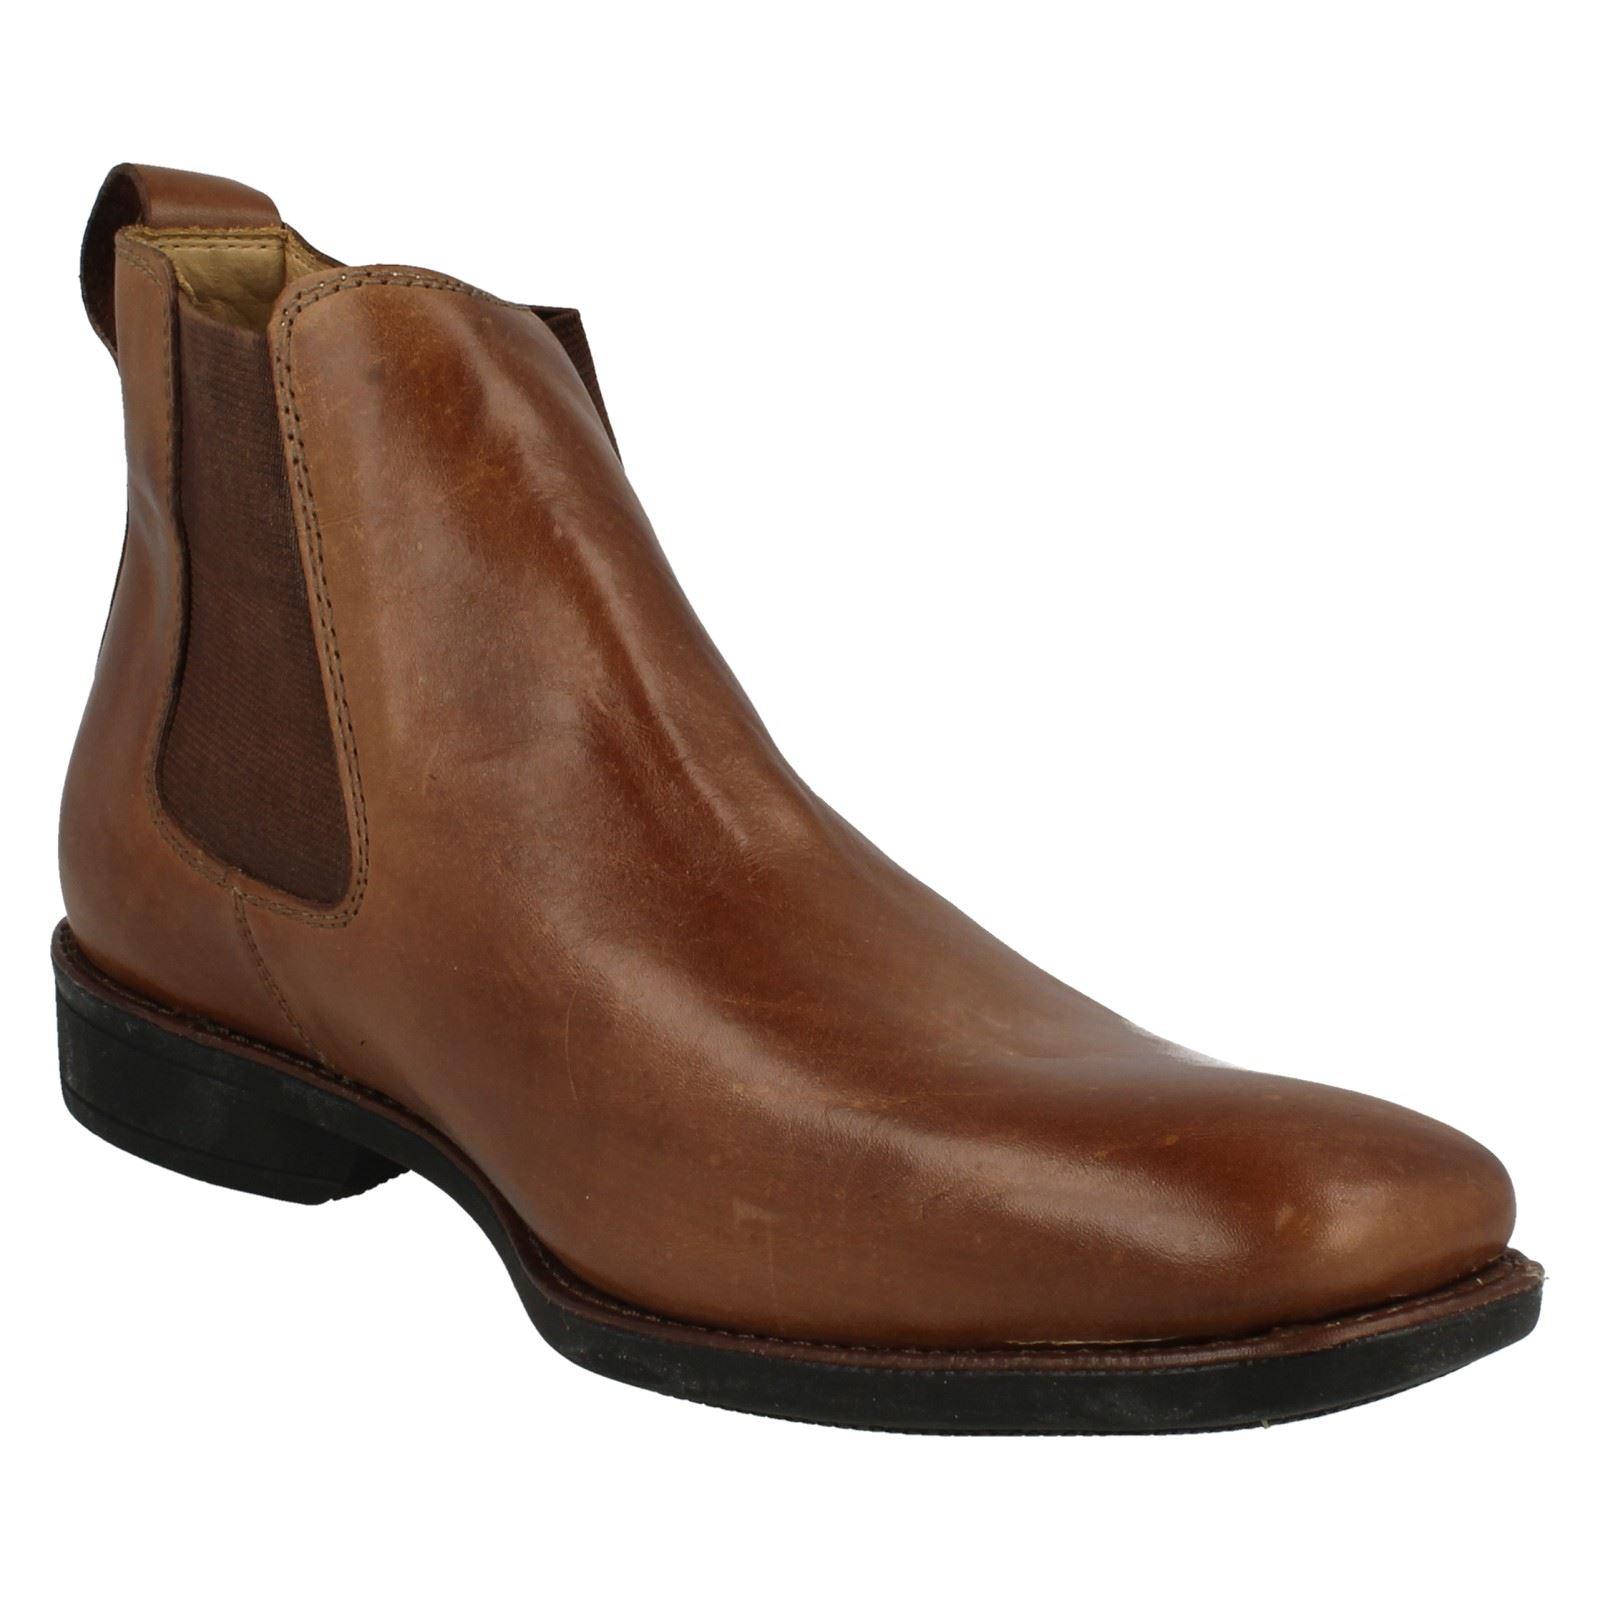 Mens-Anatomic-Chelsea-Boots-039-929211LB-039 thumbnail 16